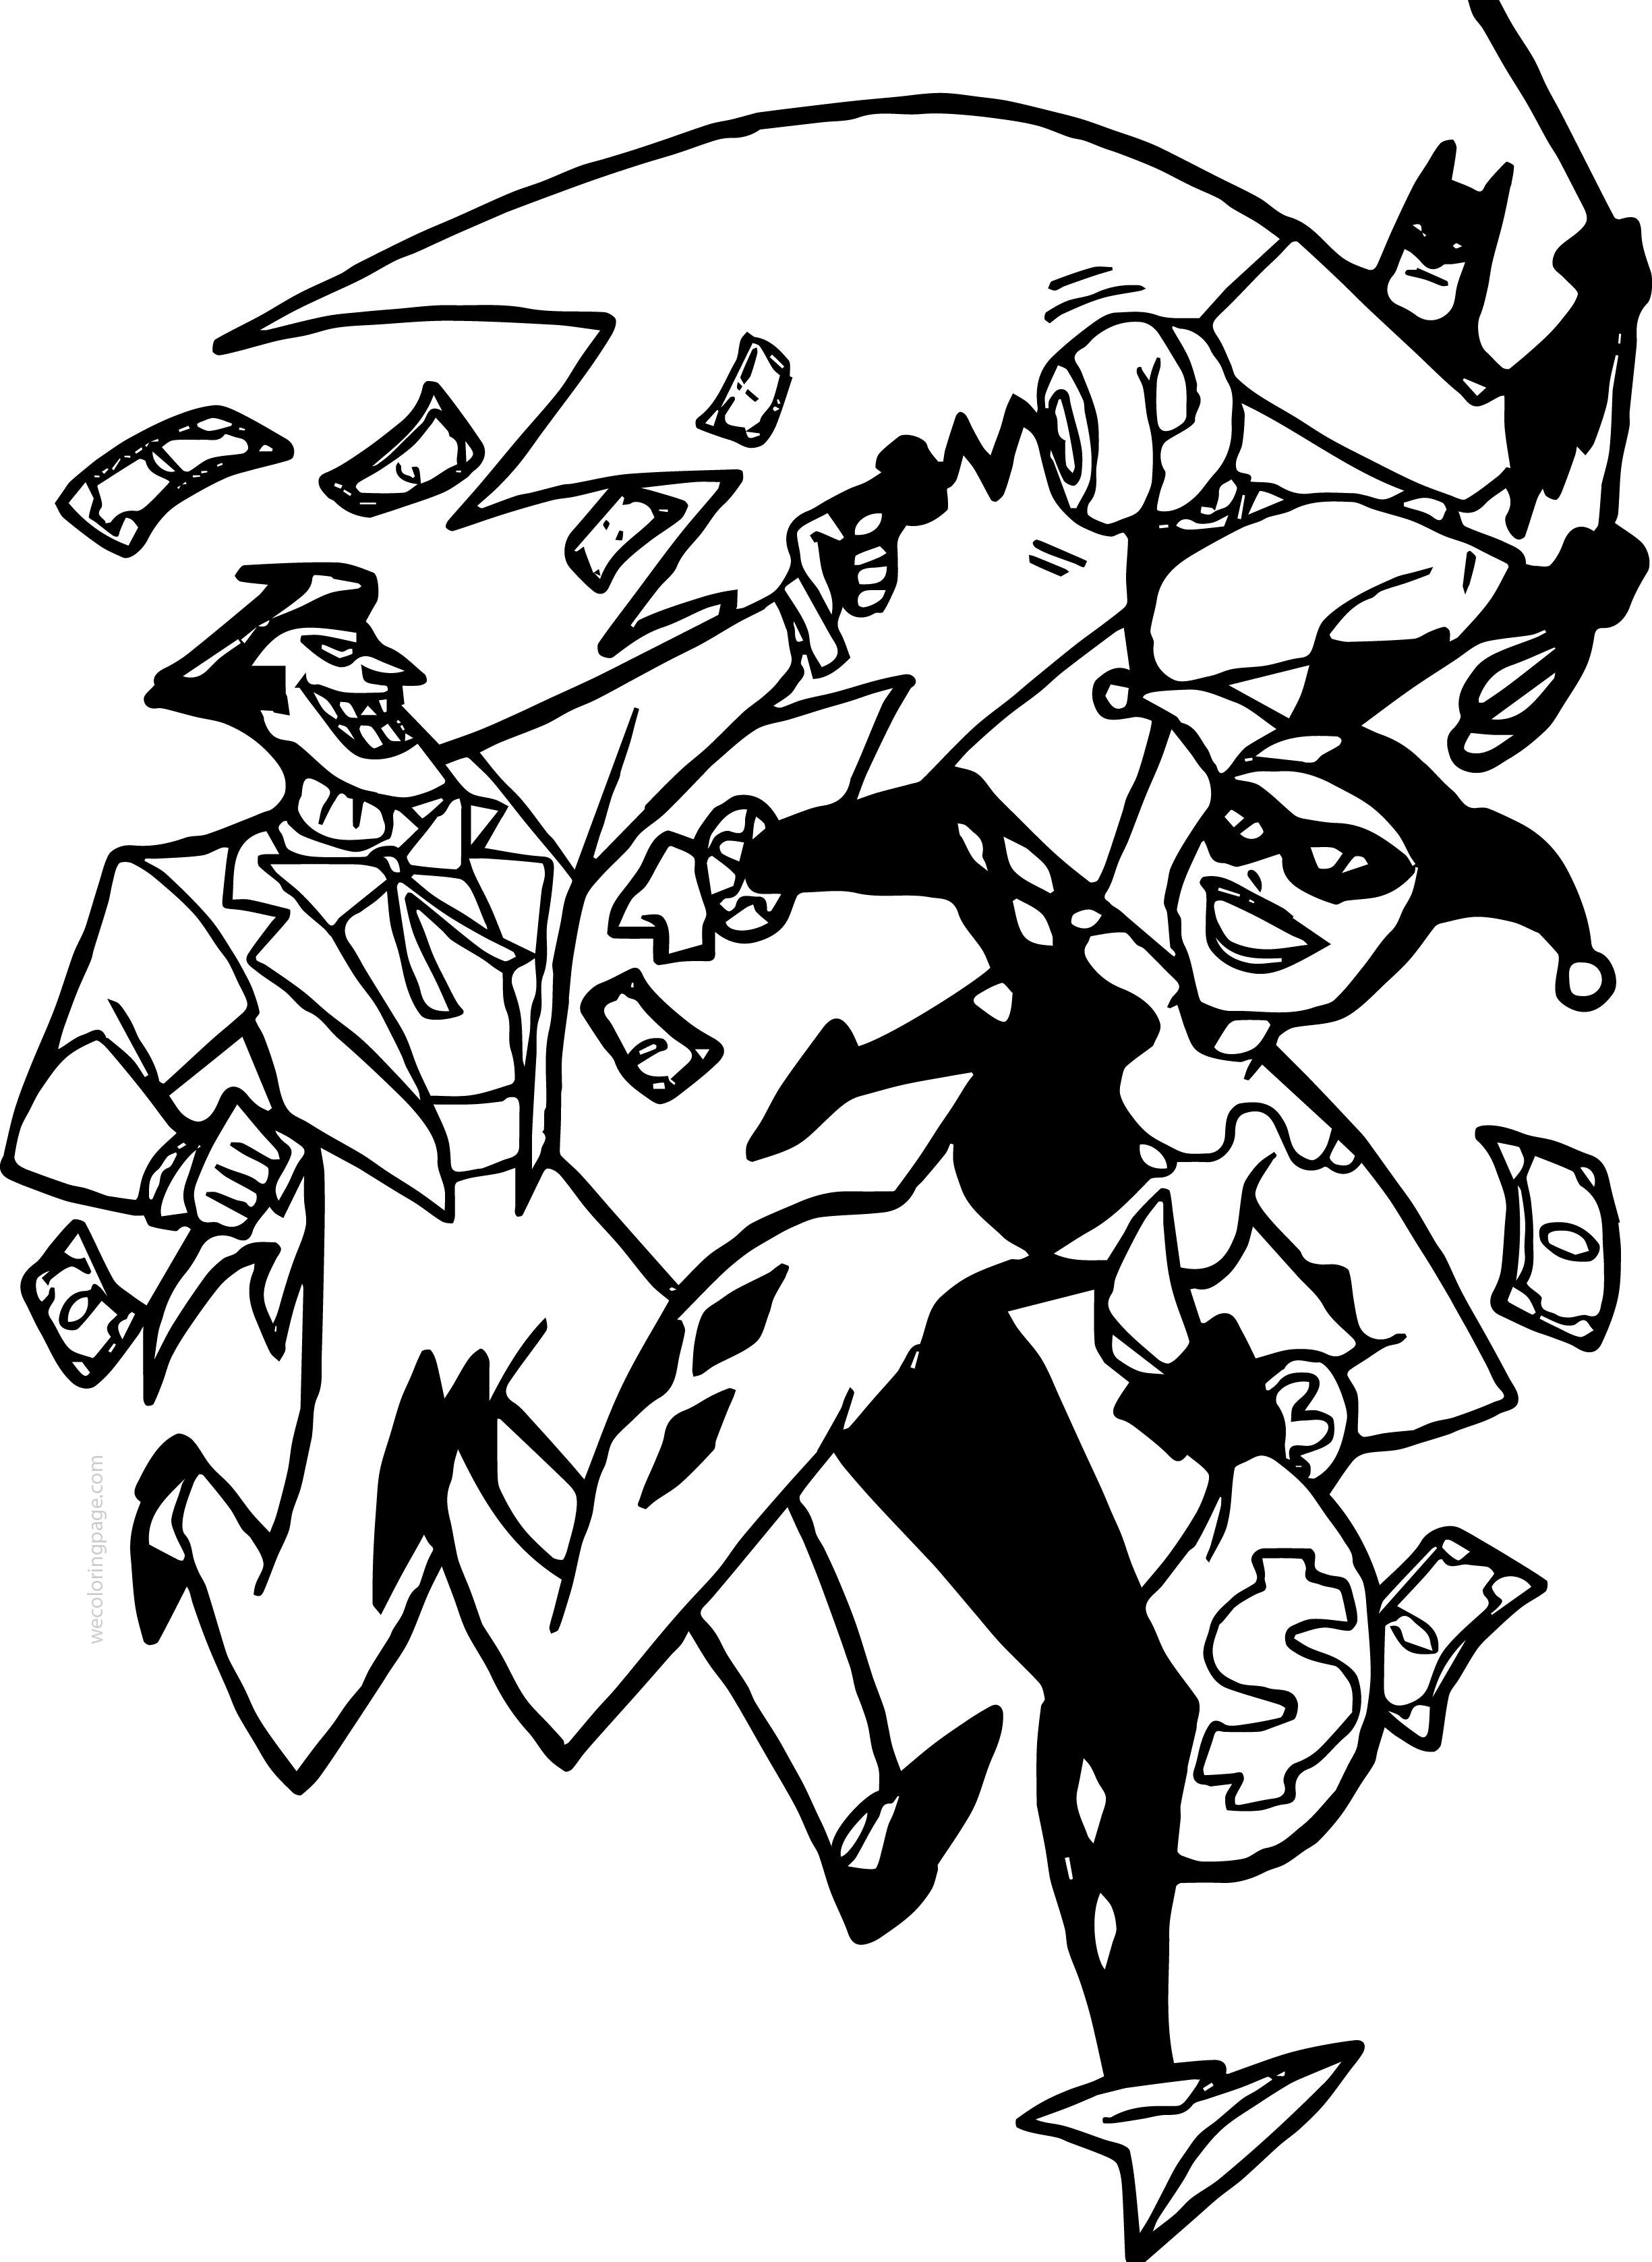 Joker Batman Cartoon Characters Coloring Page